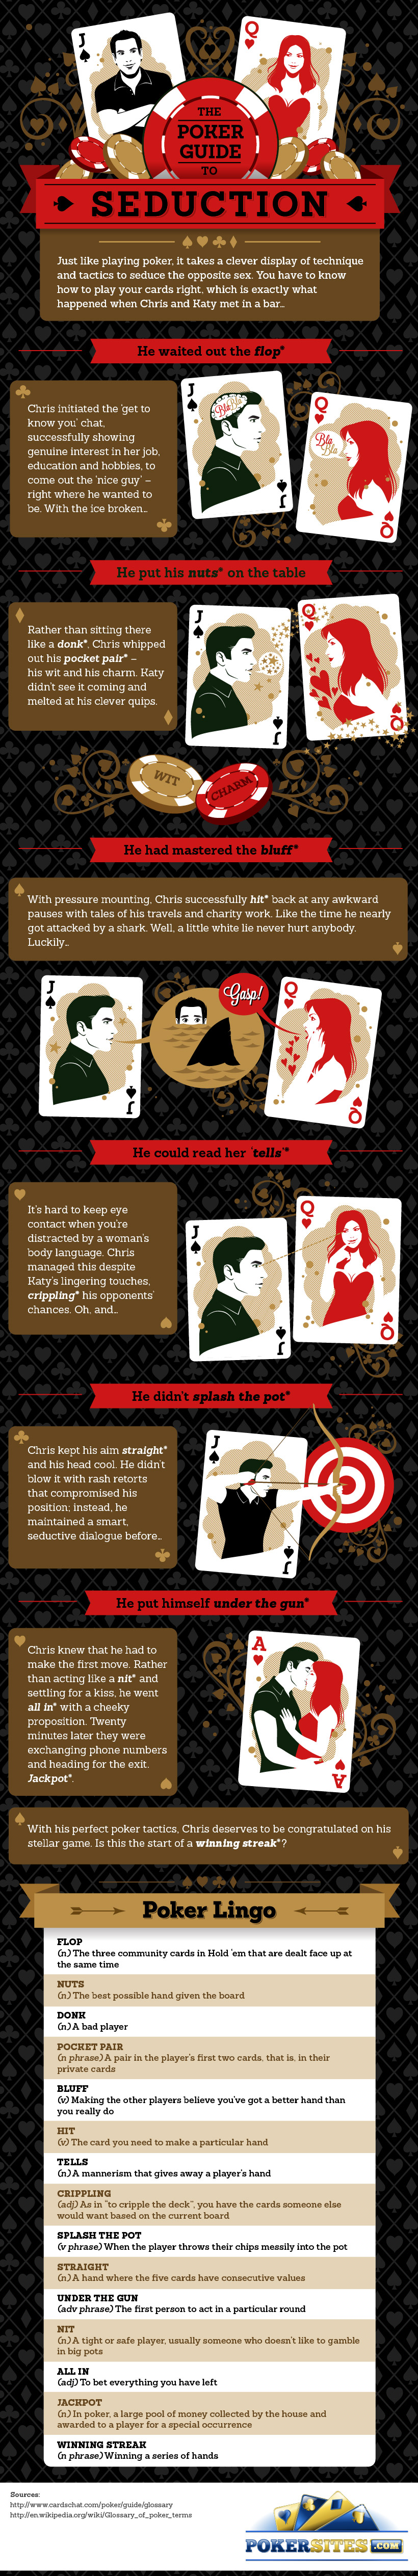 Poker & The Art Of Seduction